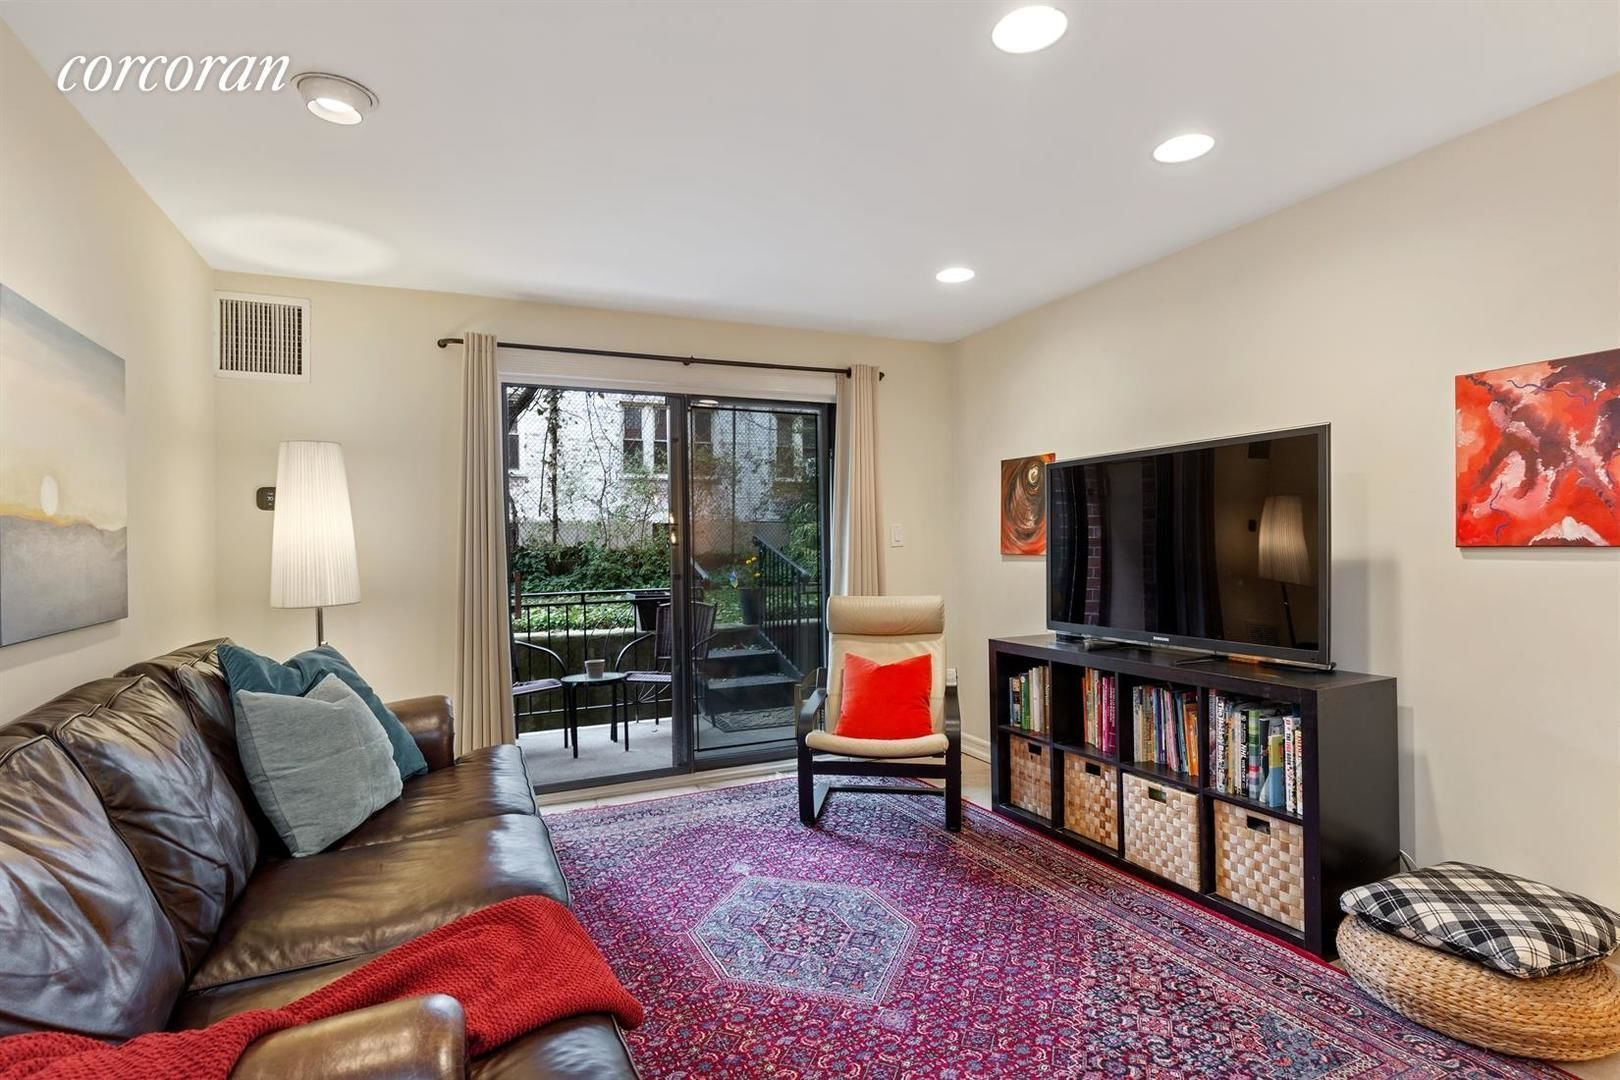 Apartment for sale at 26 Oliver Street, Apt 1C